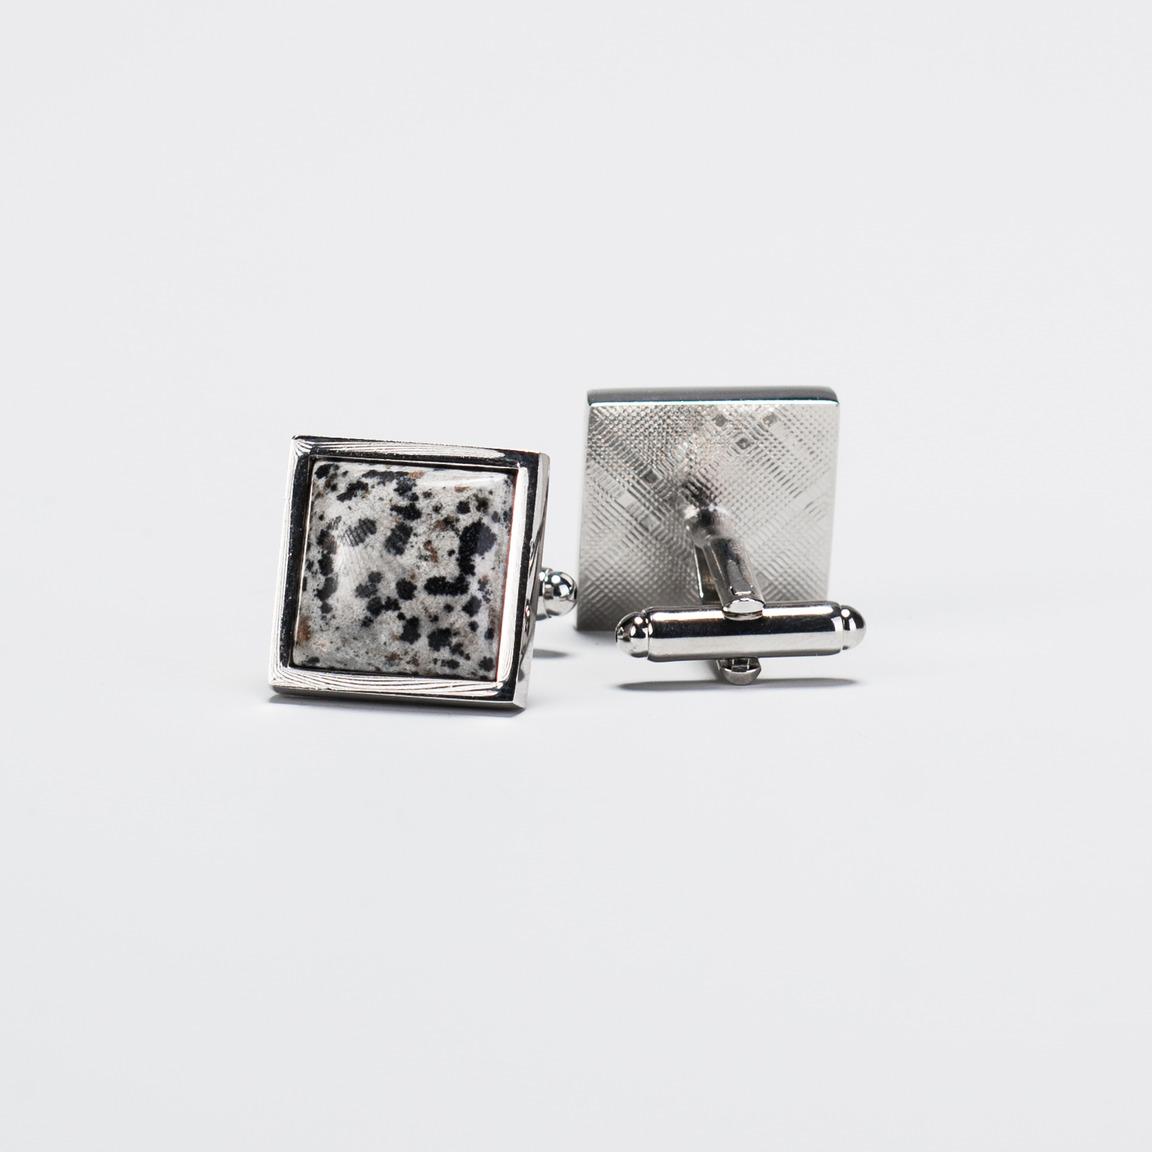 Speckled Stone Cufflinks